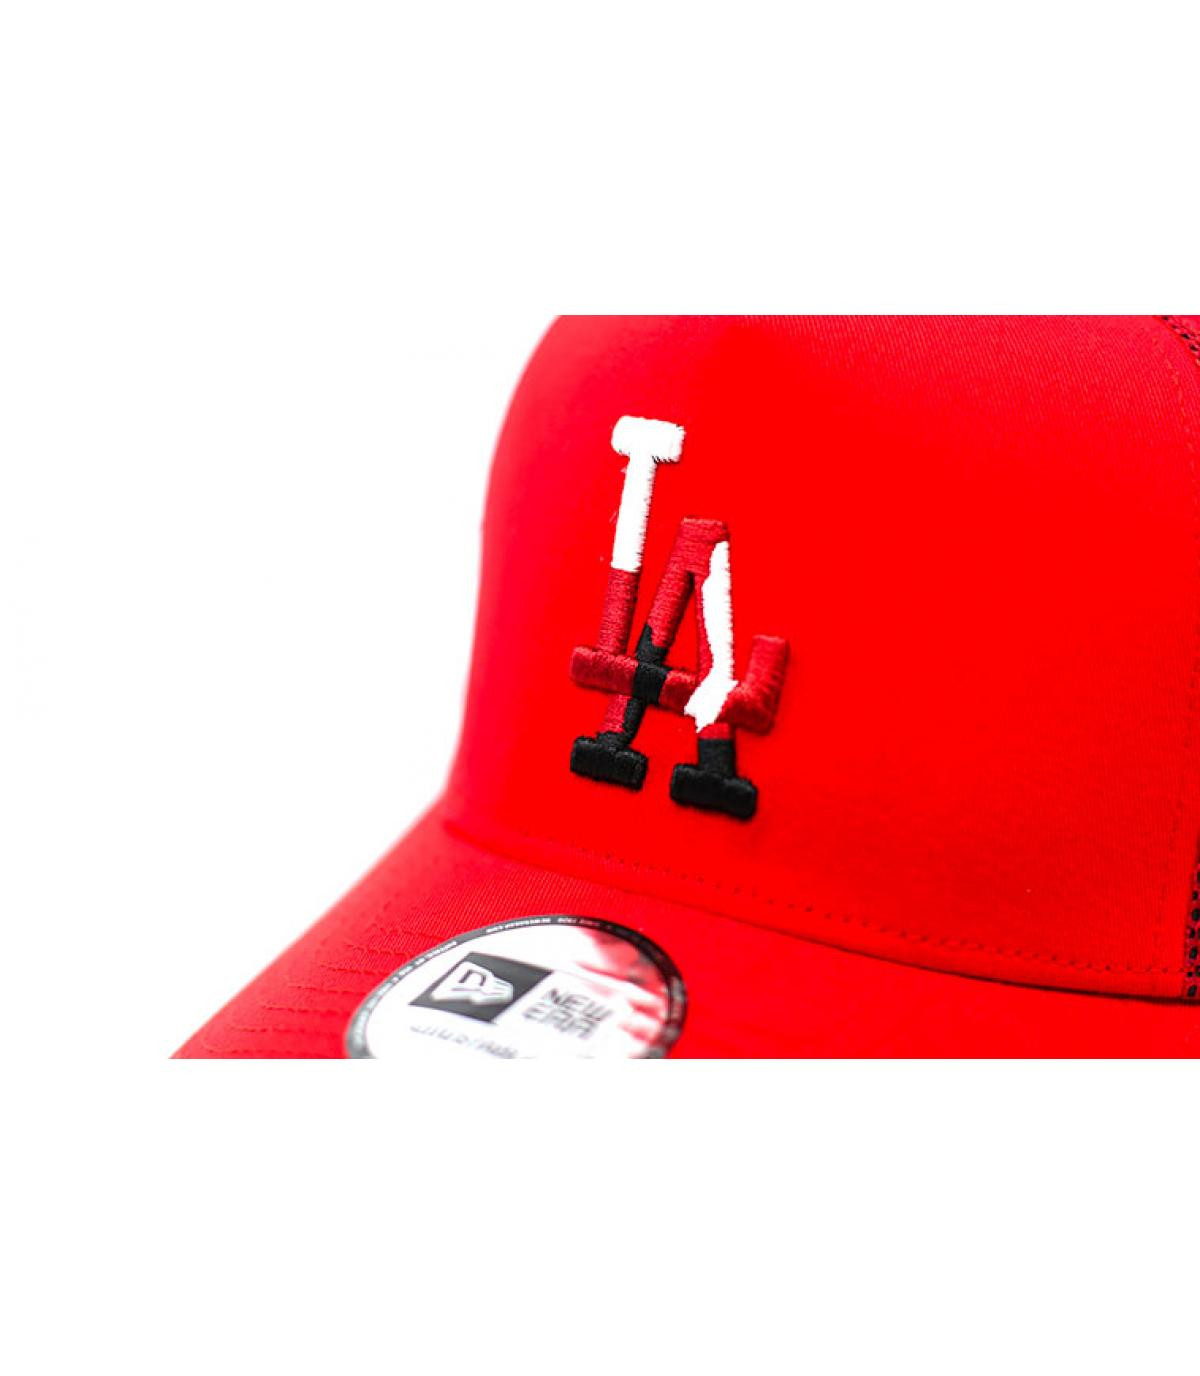 Details Trucker Camo Infill LA red - Abbildung 3